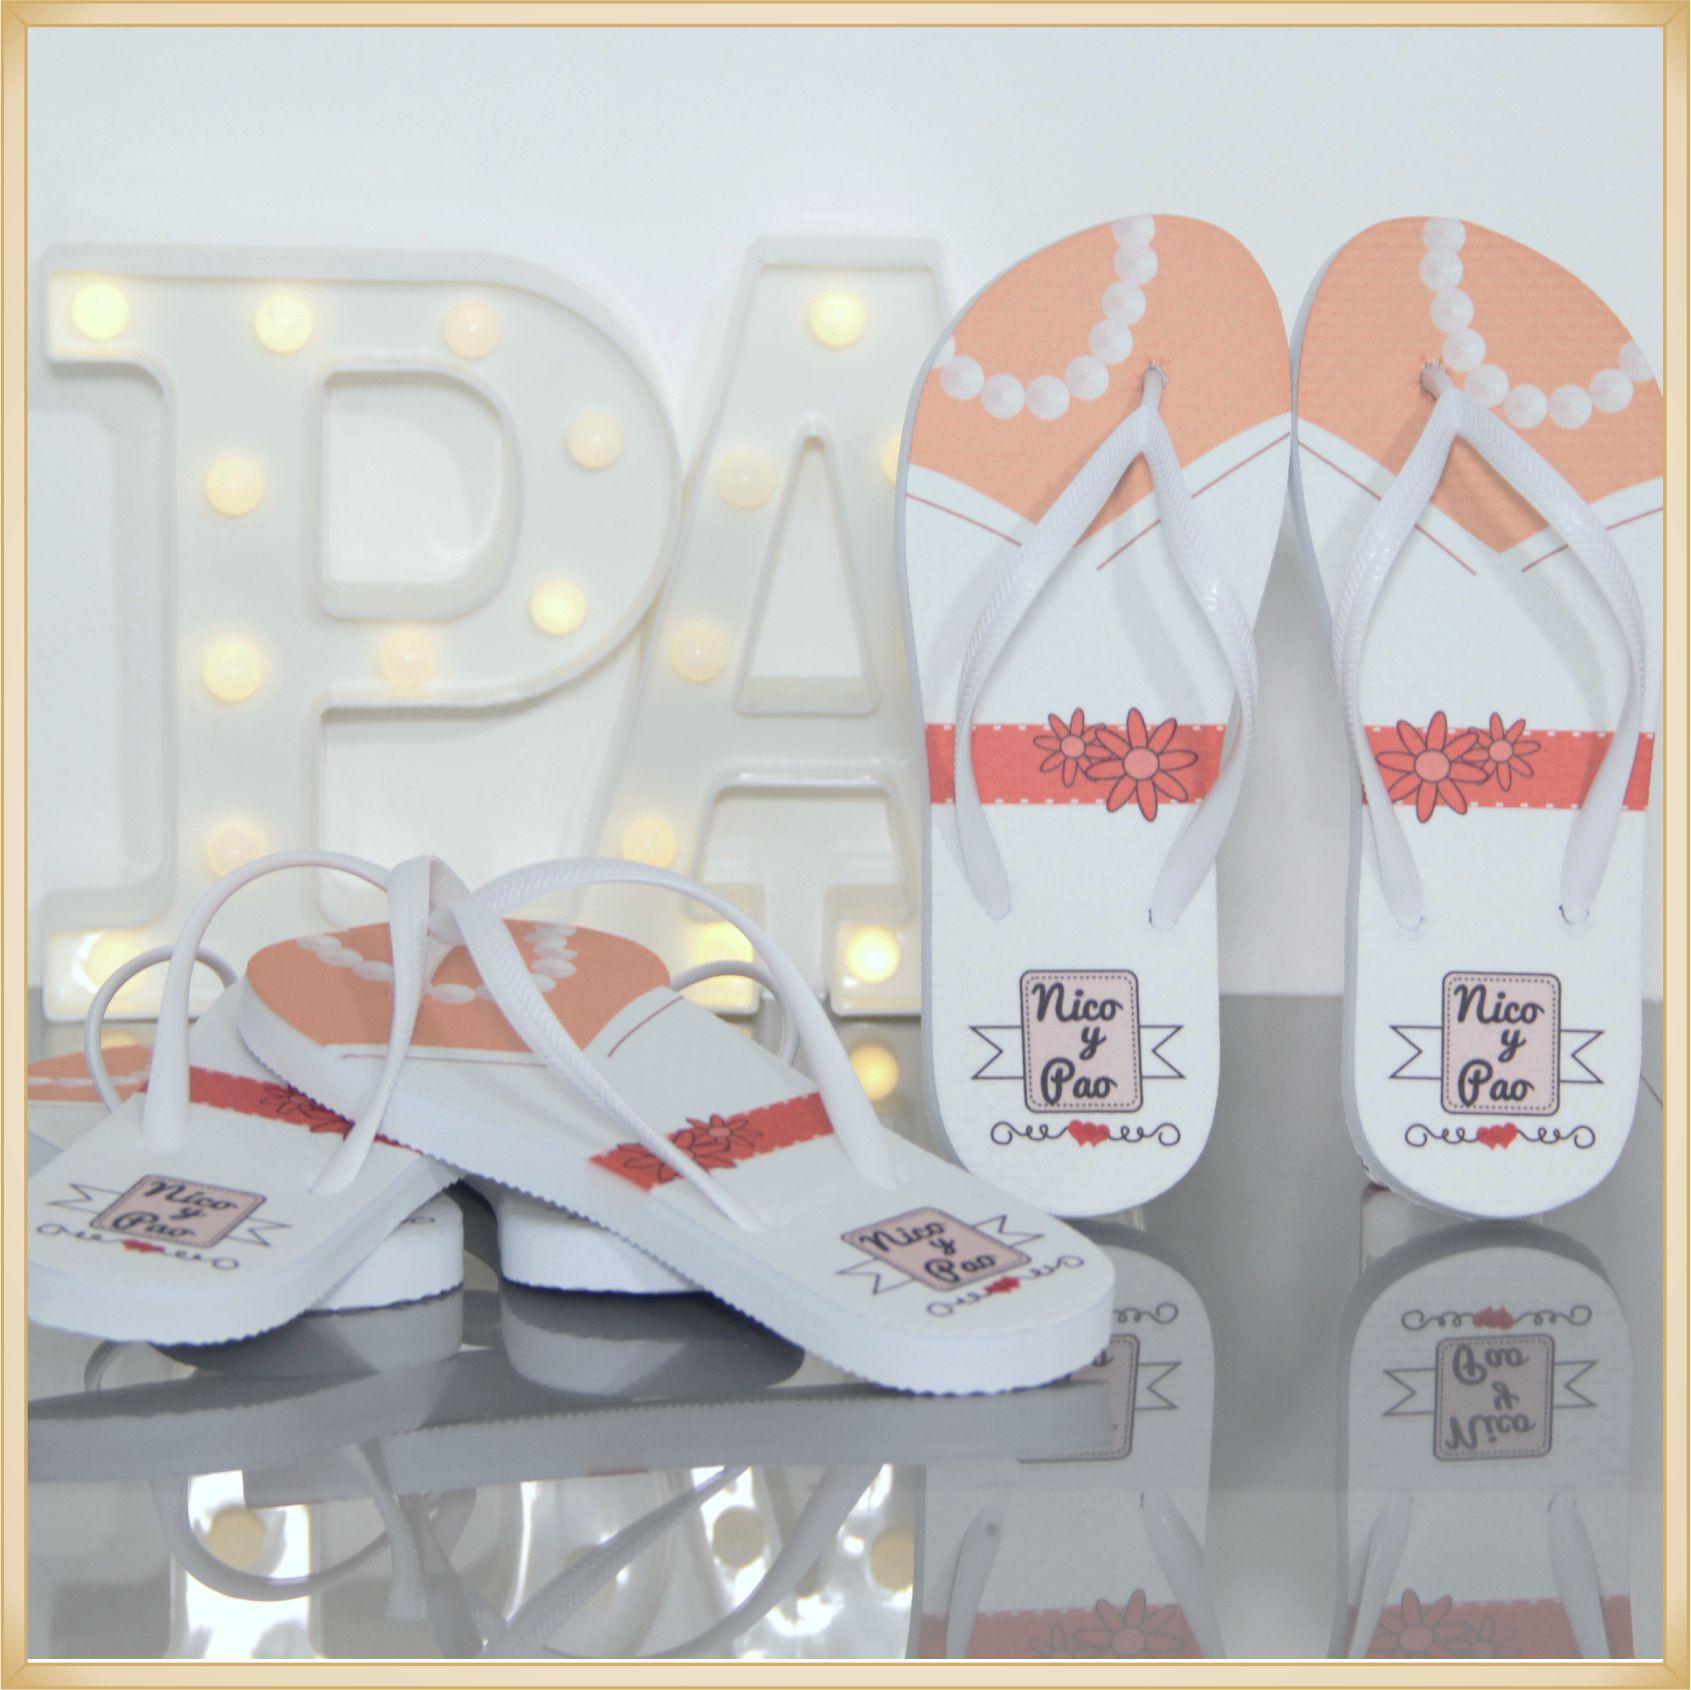 fce64327b9ff14 20 Chinelos Personalizados para festas de casamento brindes para ...